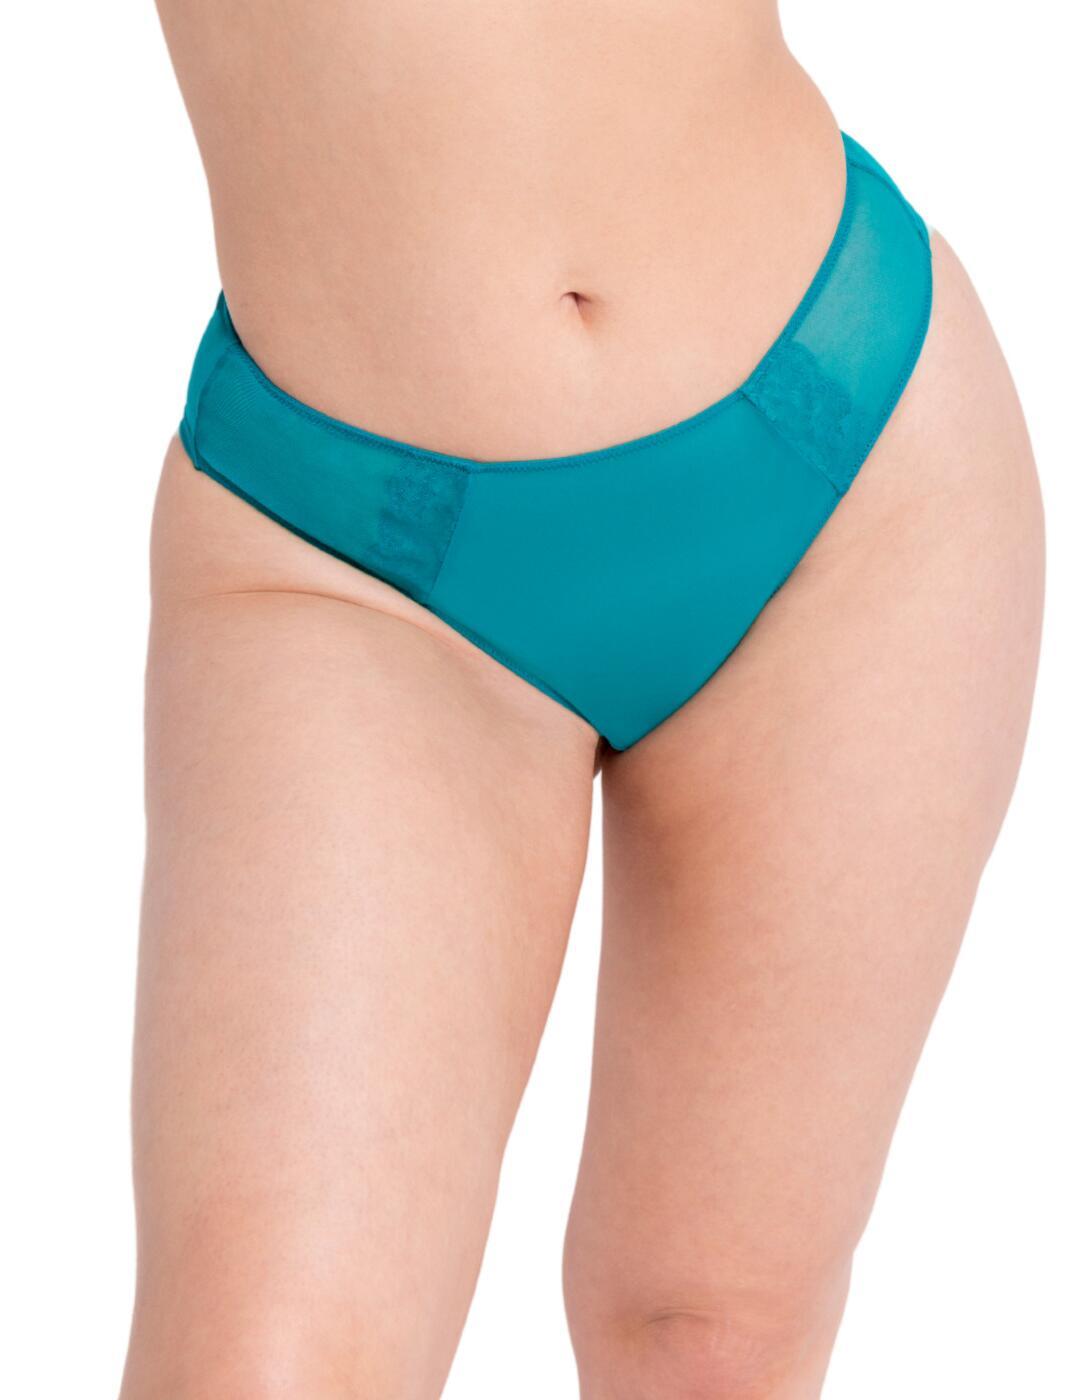 CK026202 Curvy Kate Eye Spy Brazilian Brief - CK026202 Turquoise